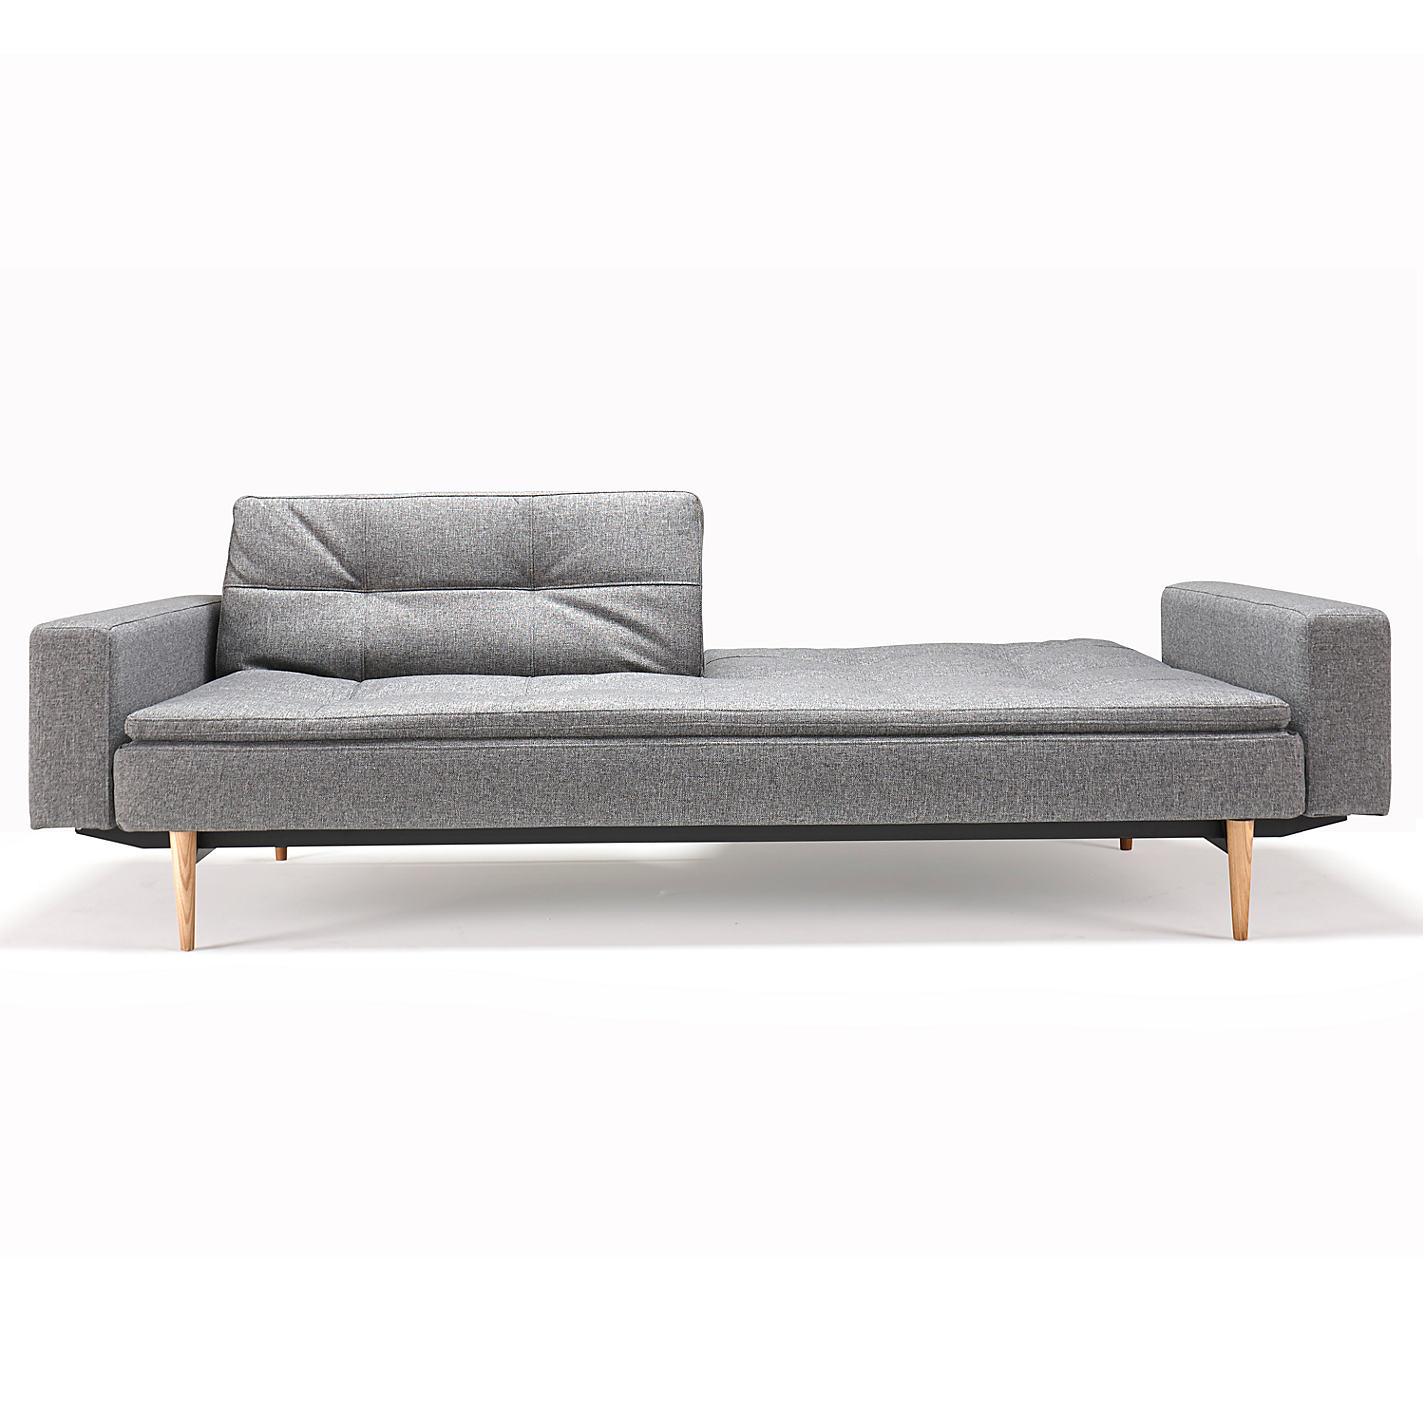 innovation sofa bed malaysia hereo sofa. Black Bedroom Furniture Sets. Home Design Ideas